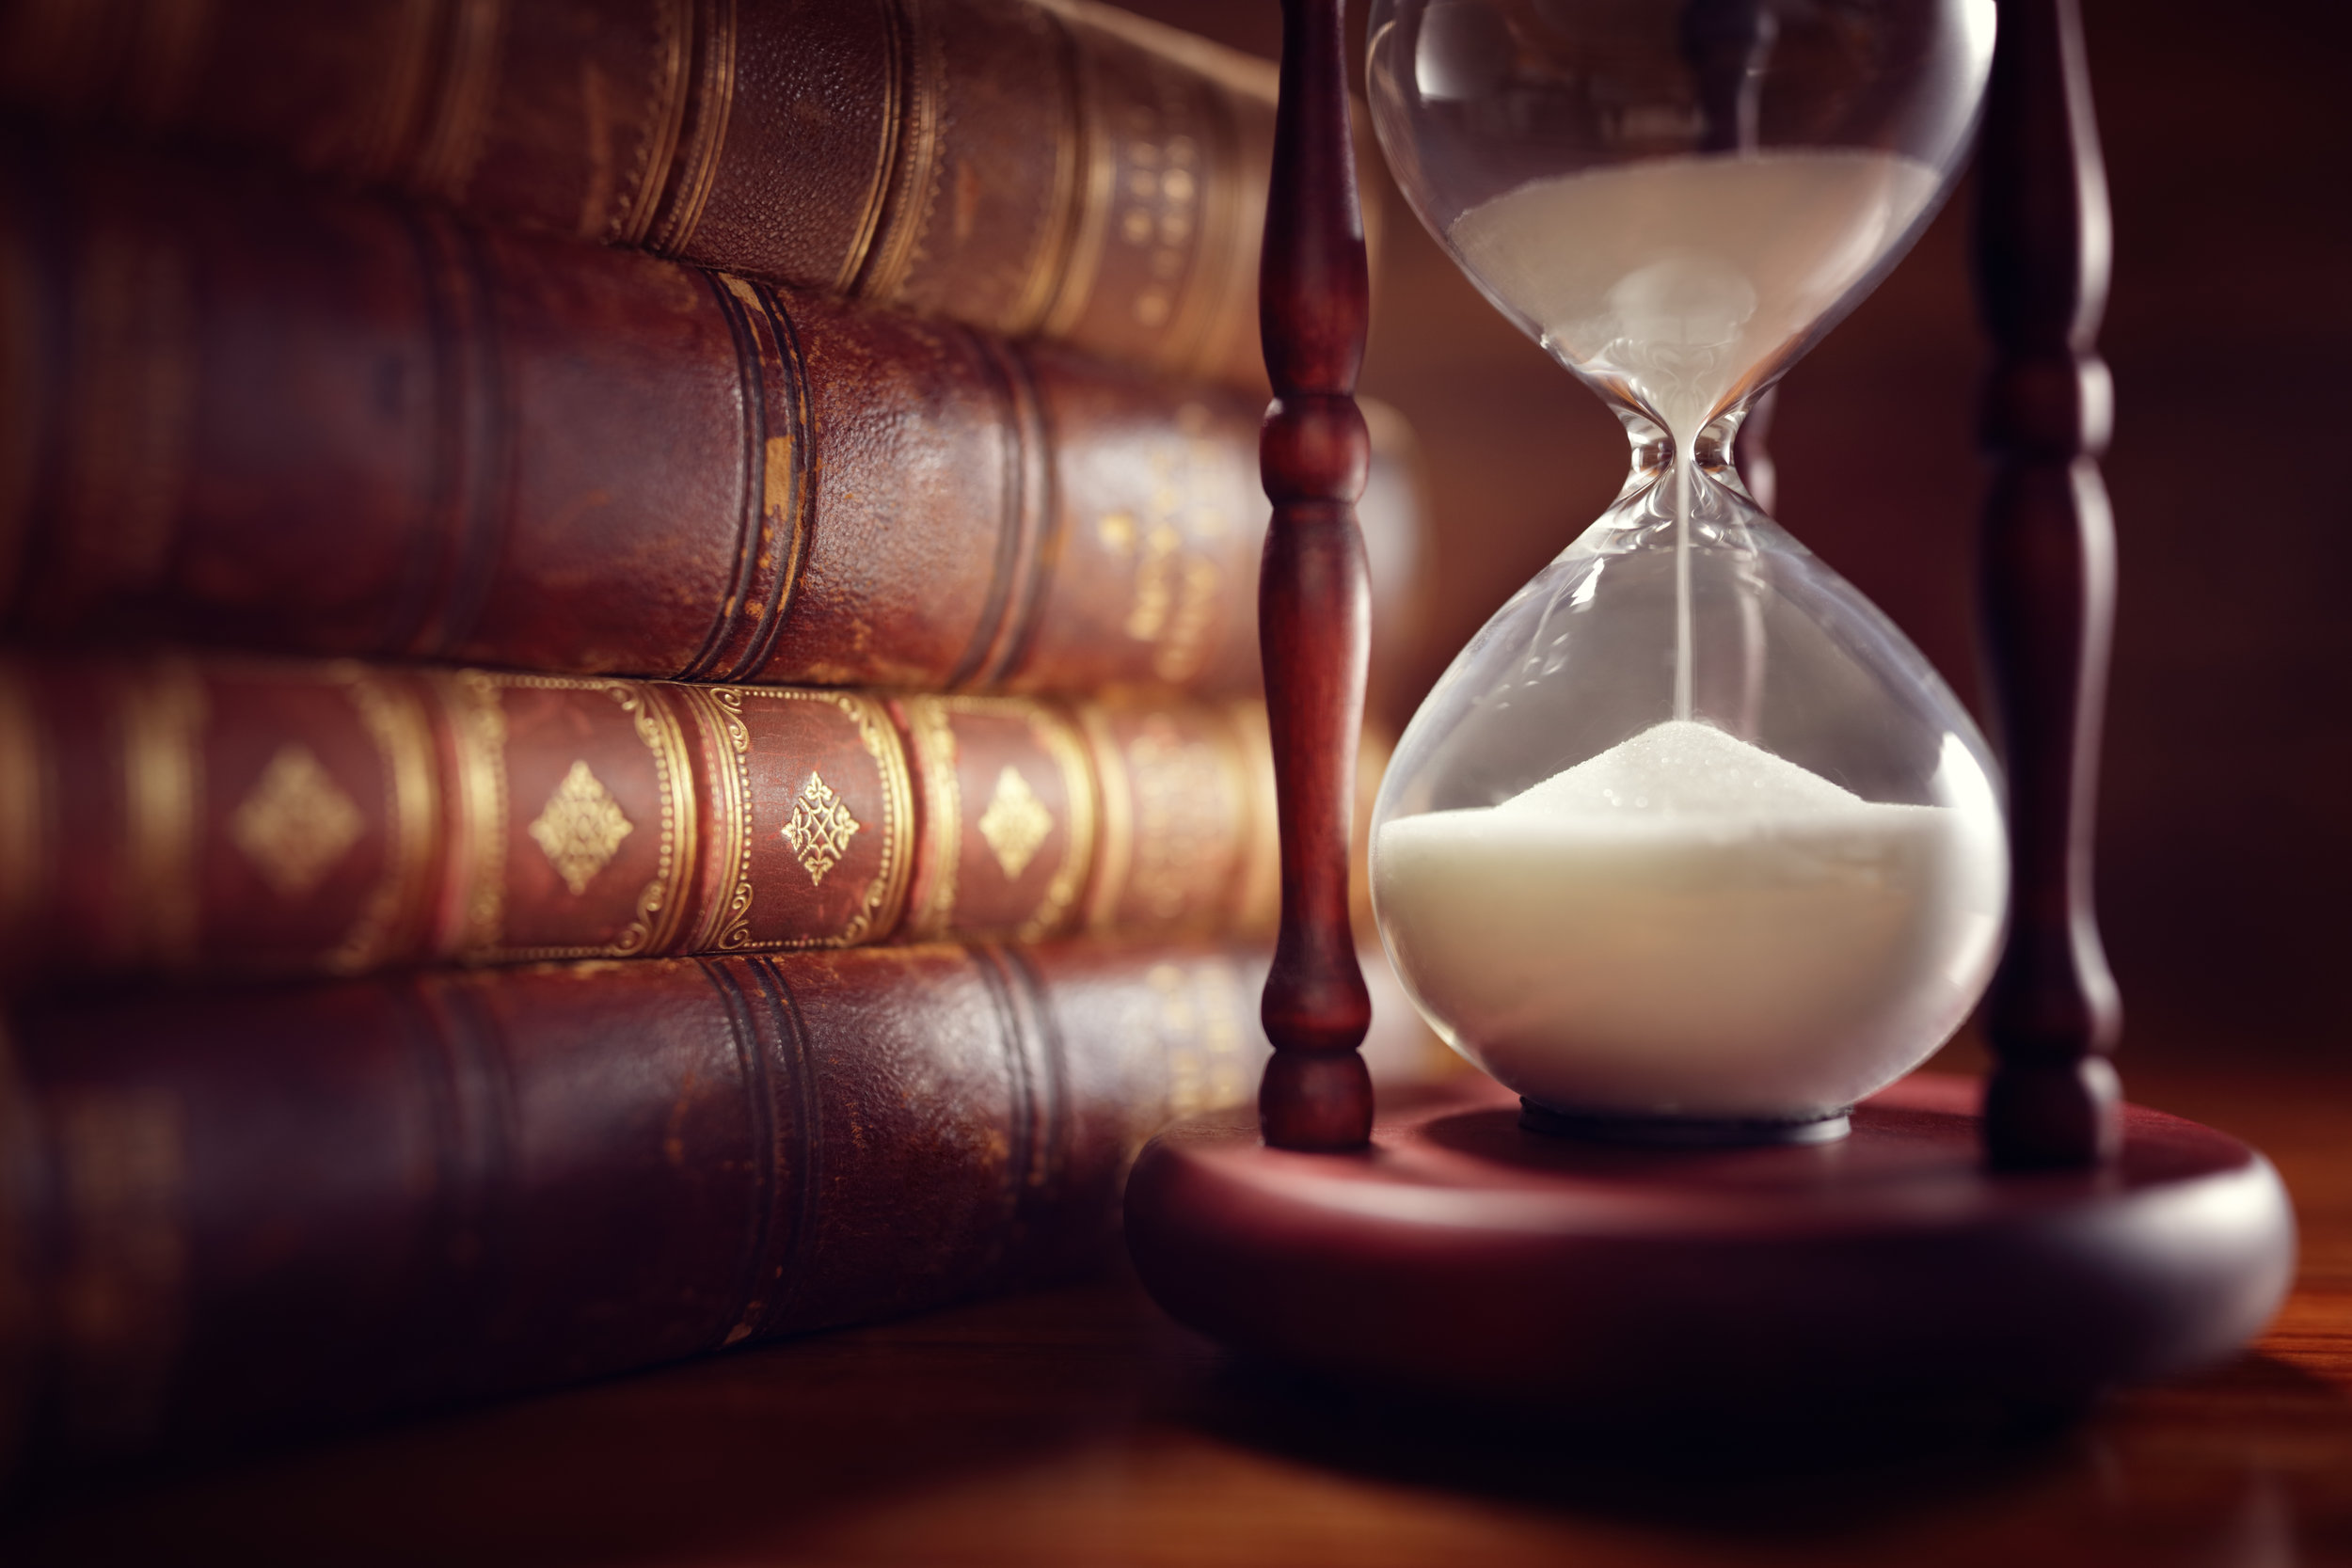 old-books-and-hourglass-P4AQDYZ.jpg